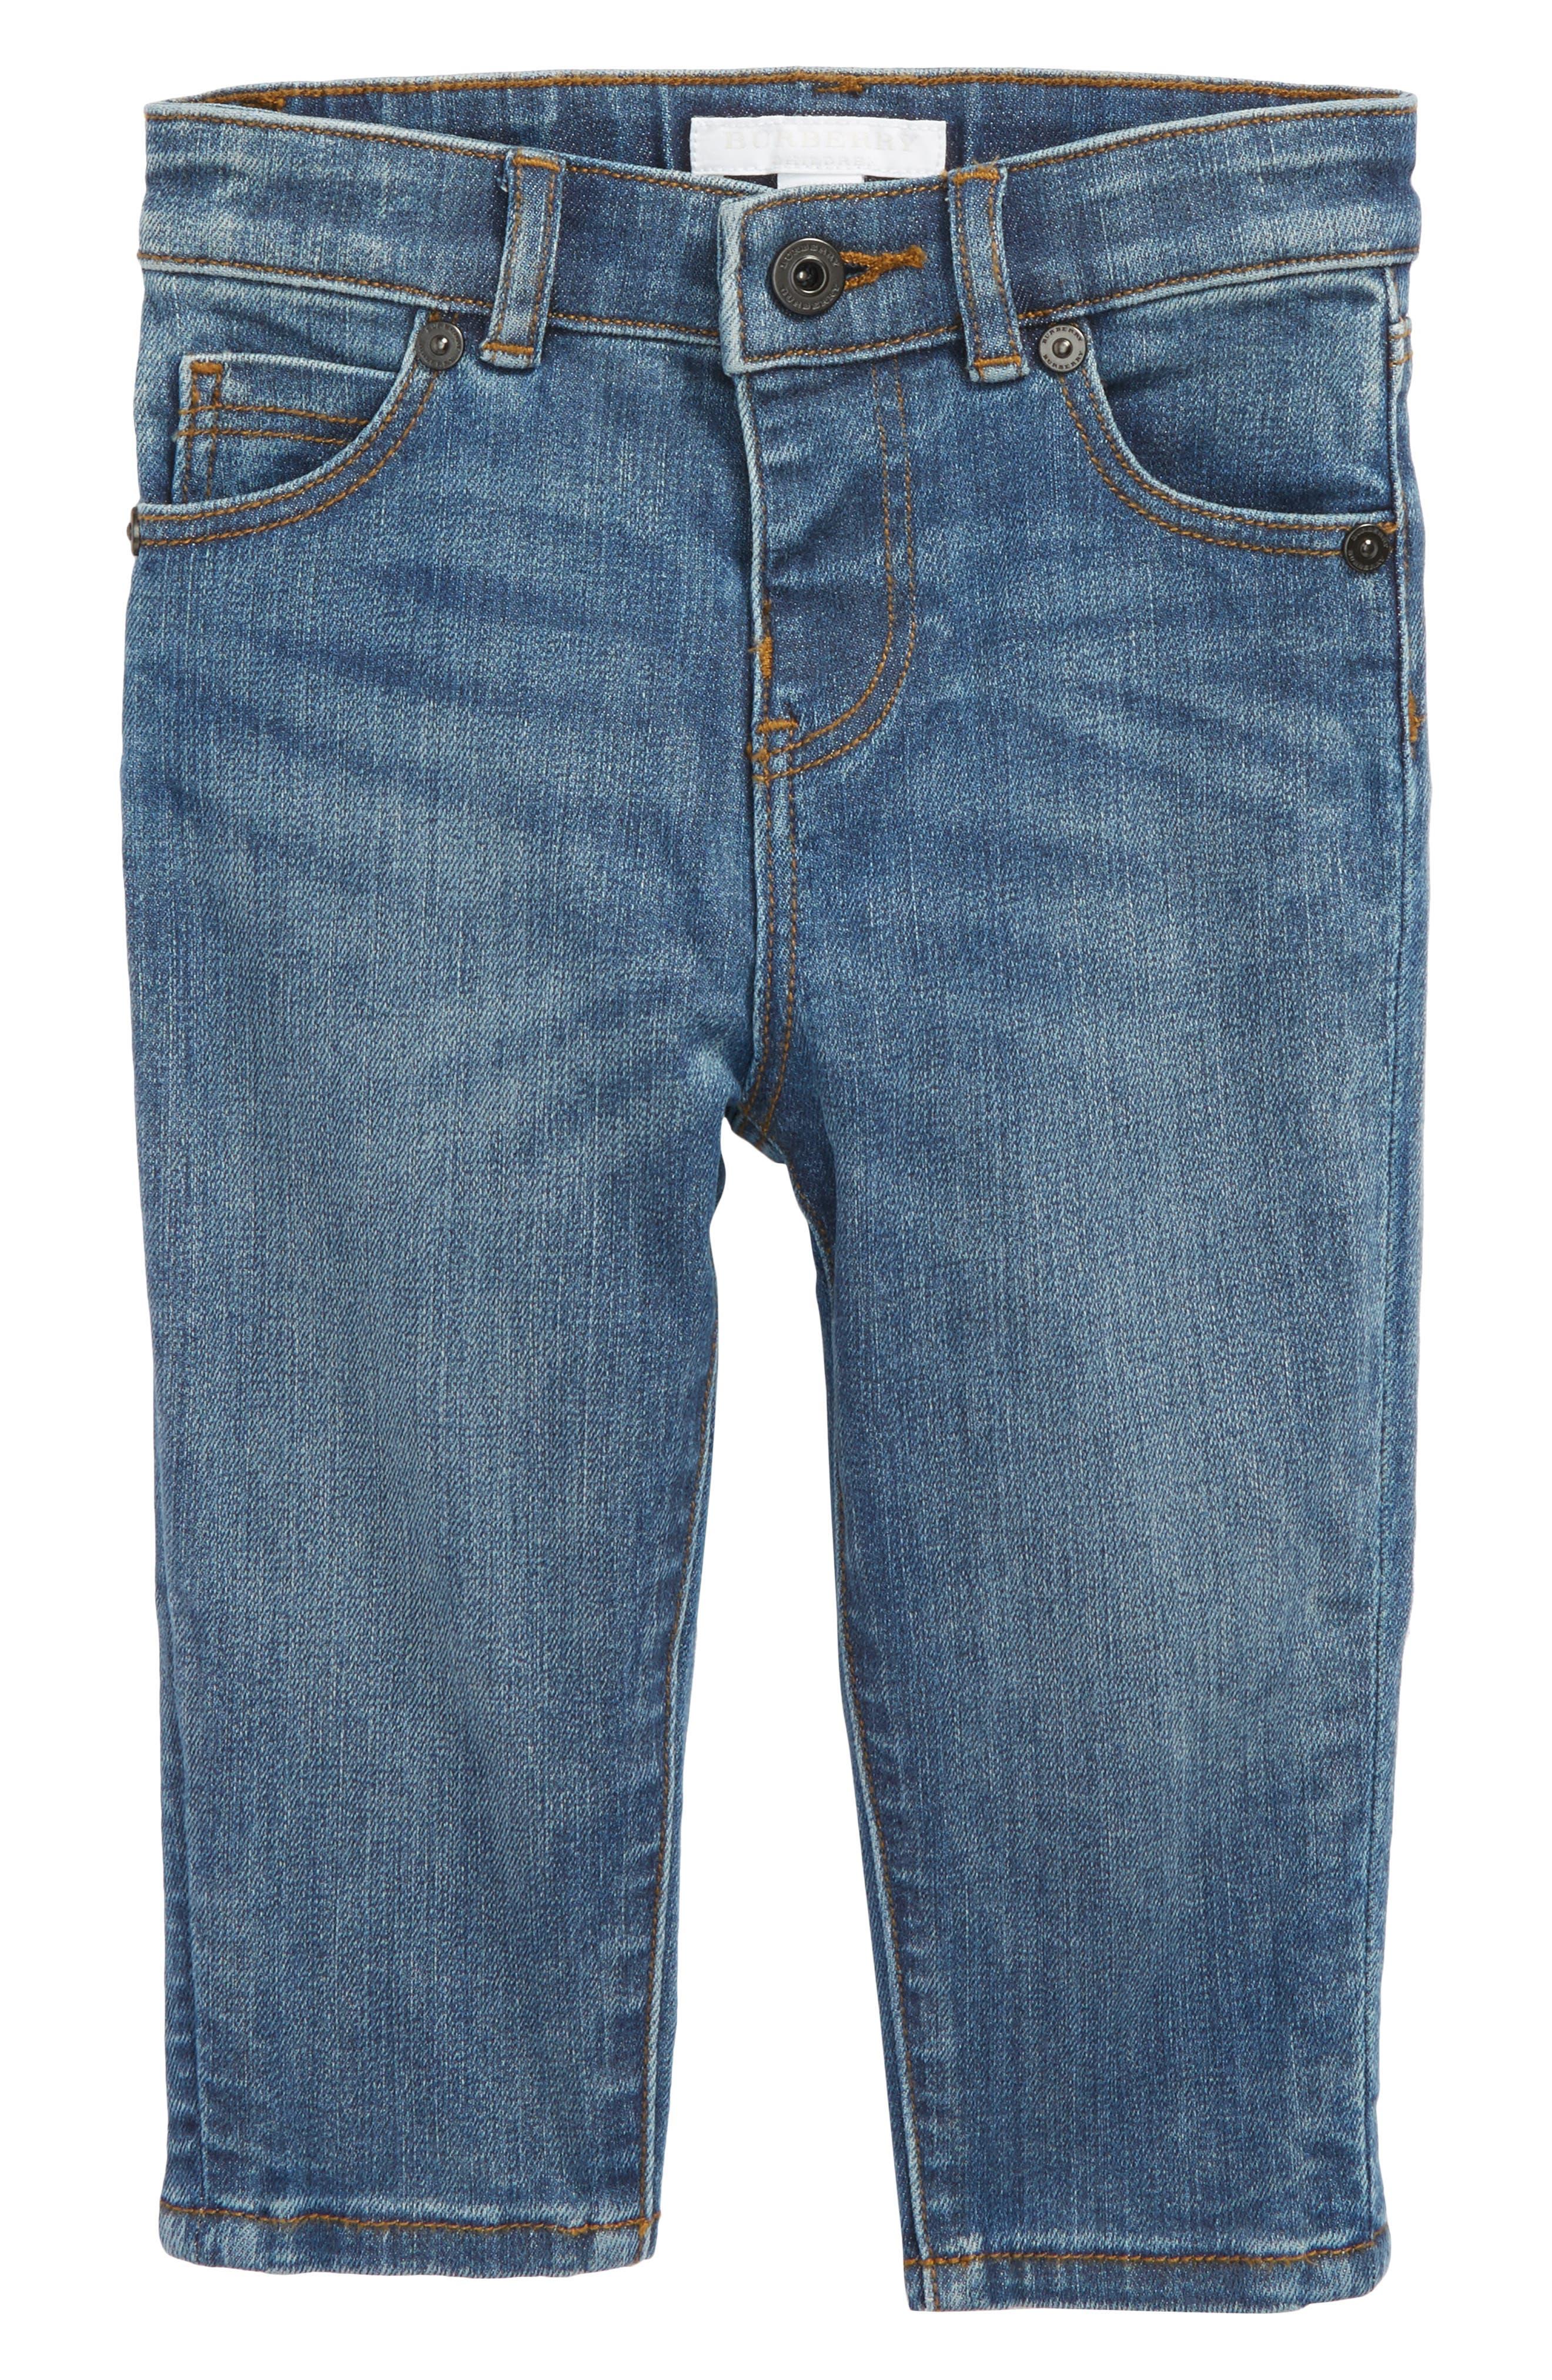 Skinny Jeans,                         Main,                         color, Medium Indigo